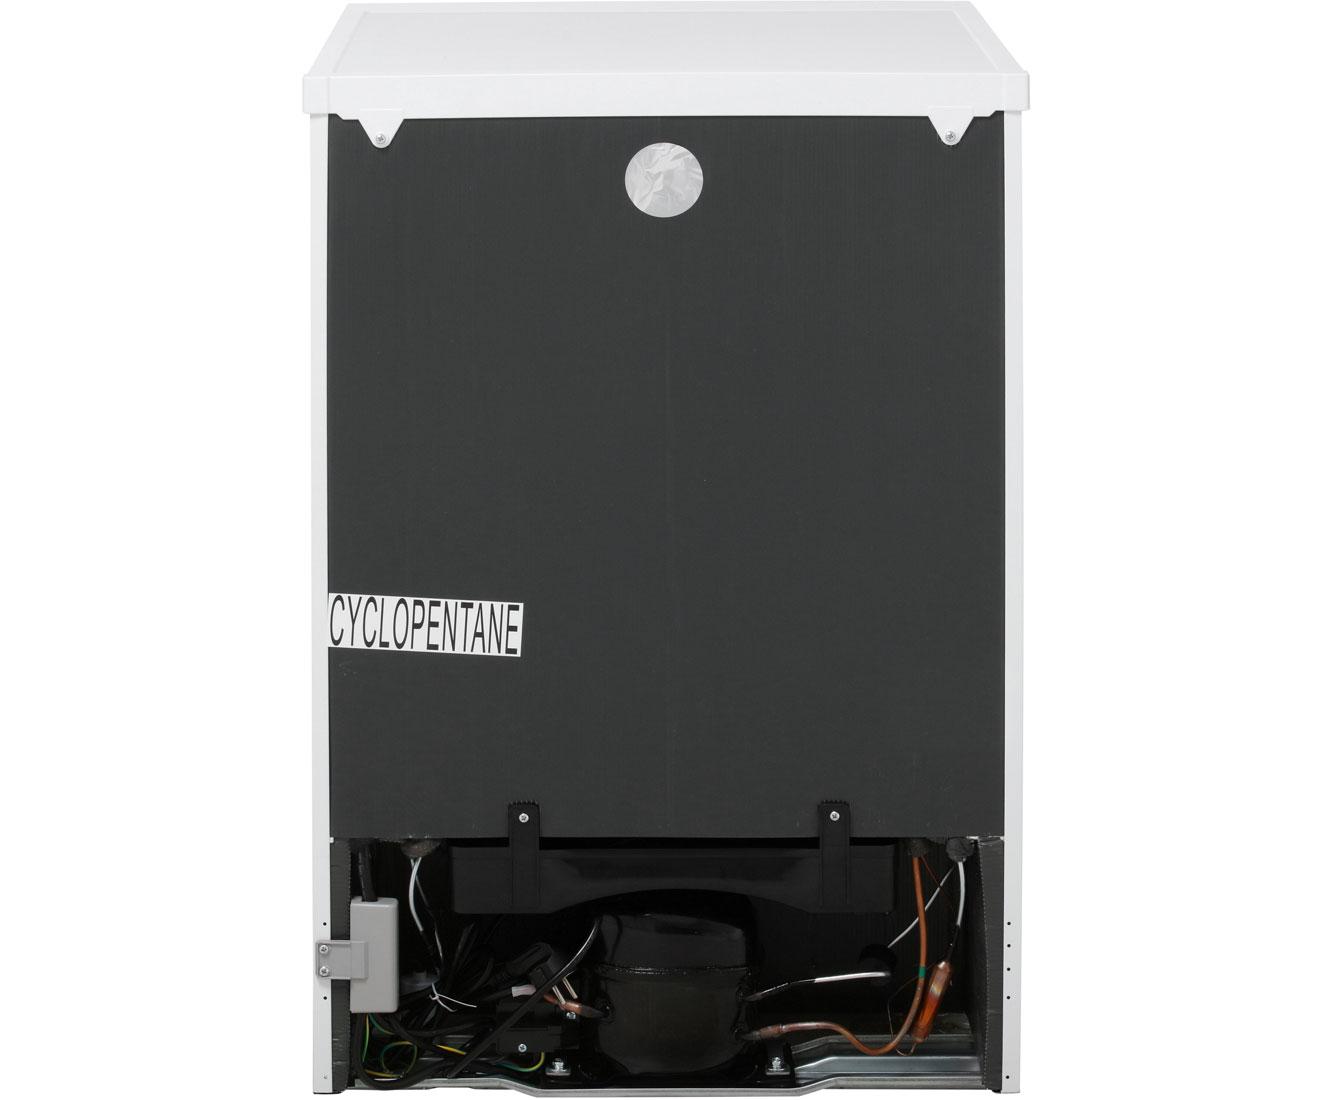 Bomann Mini Kühlschrank Durchsichtig : Bomann vs kühlschrank weiß a